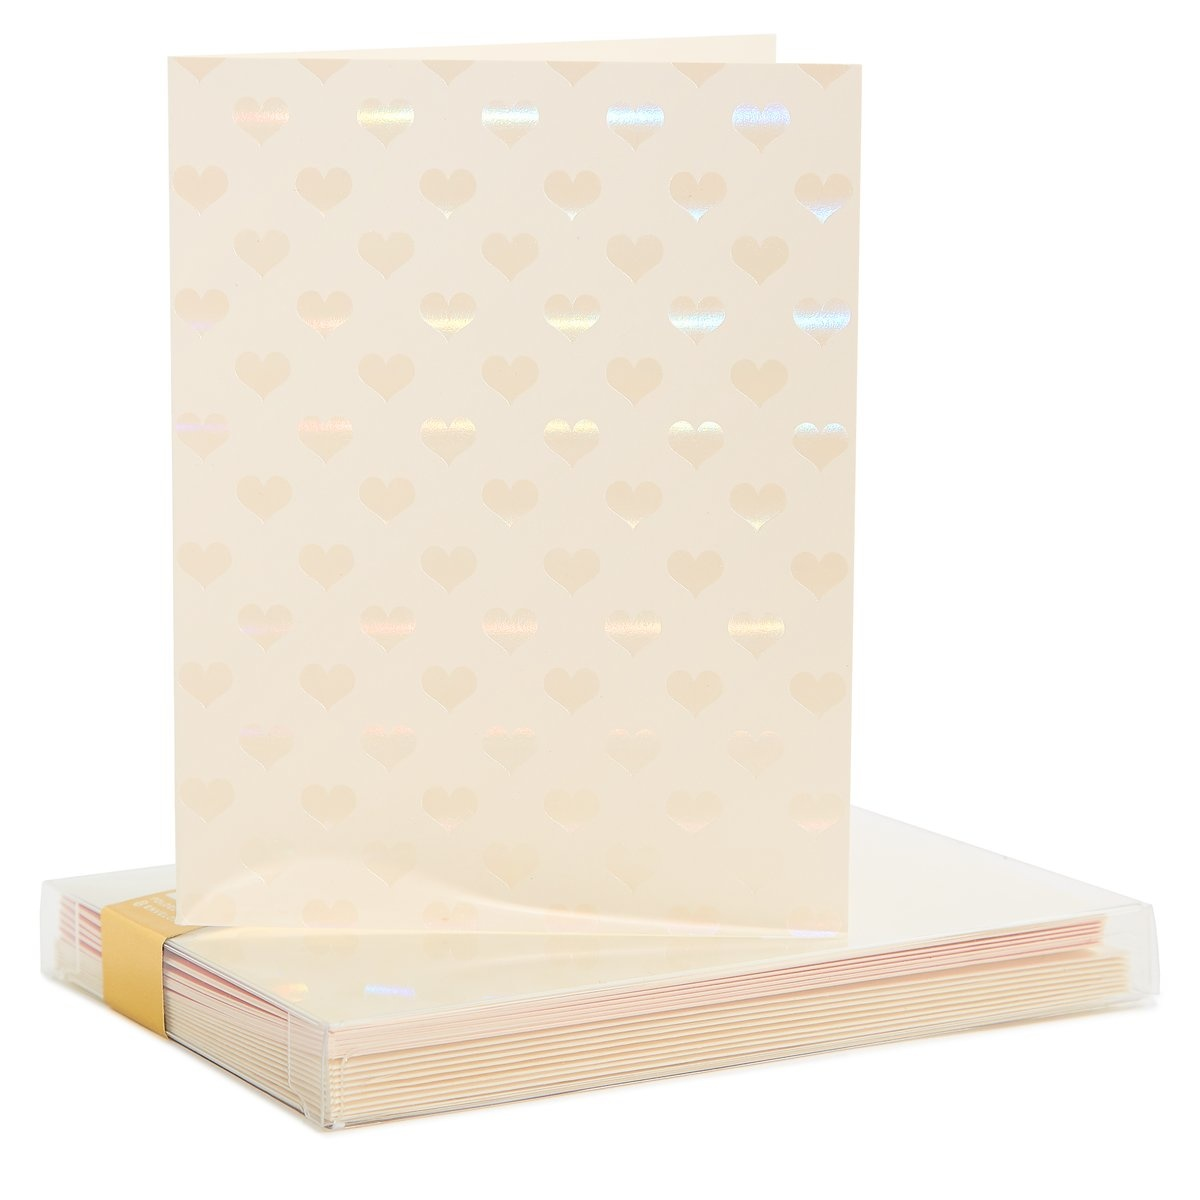 Snow & Graham Boxed #3235 Shimmer Hearts